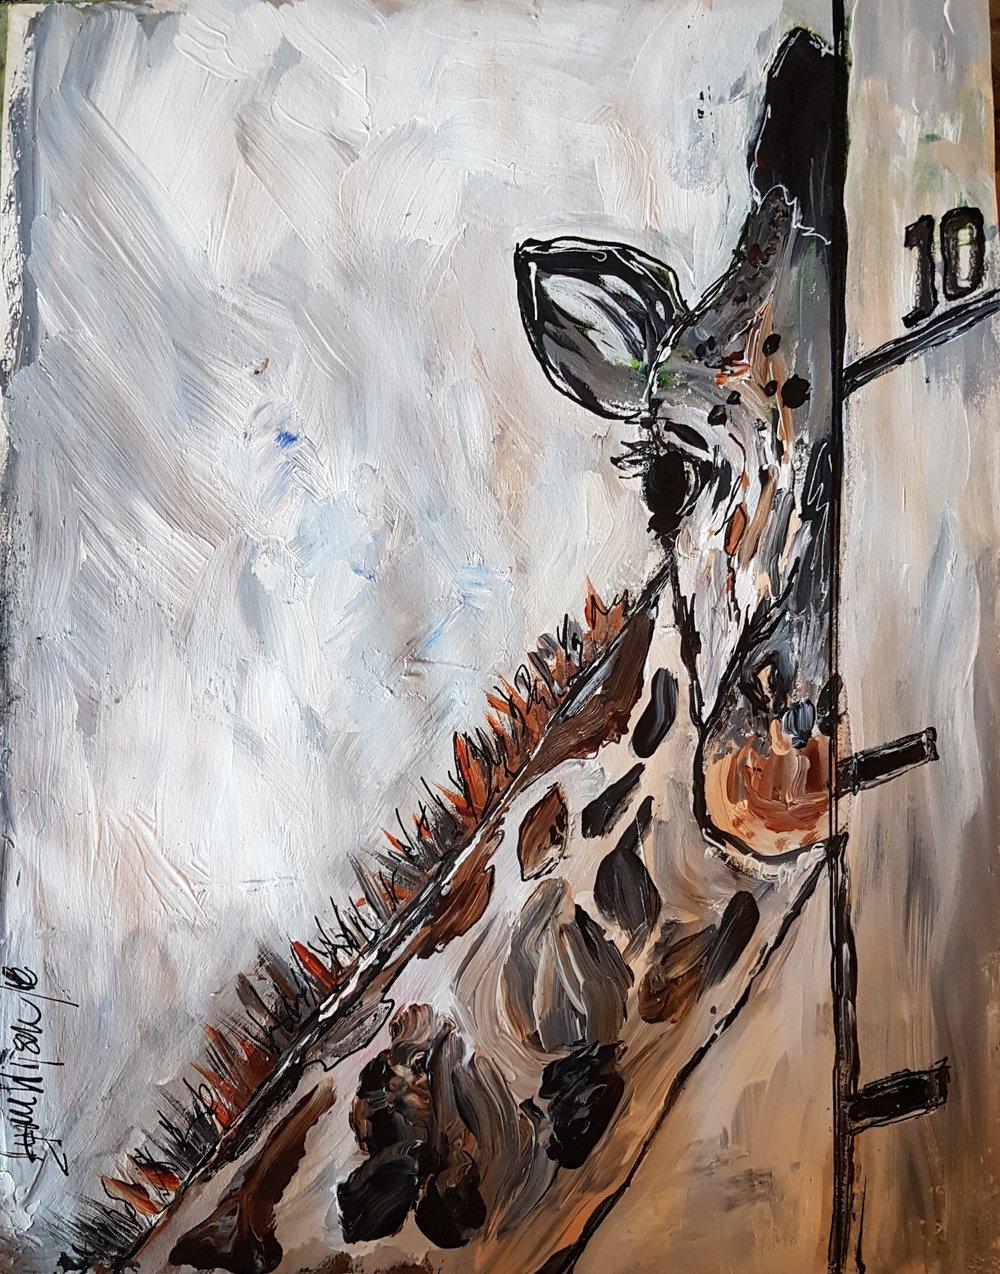 Fondas Animal Challenge Giraffe Painting June 10 2018 .jpg